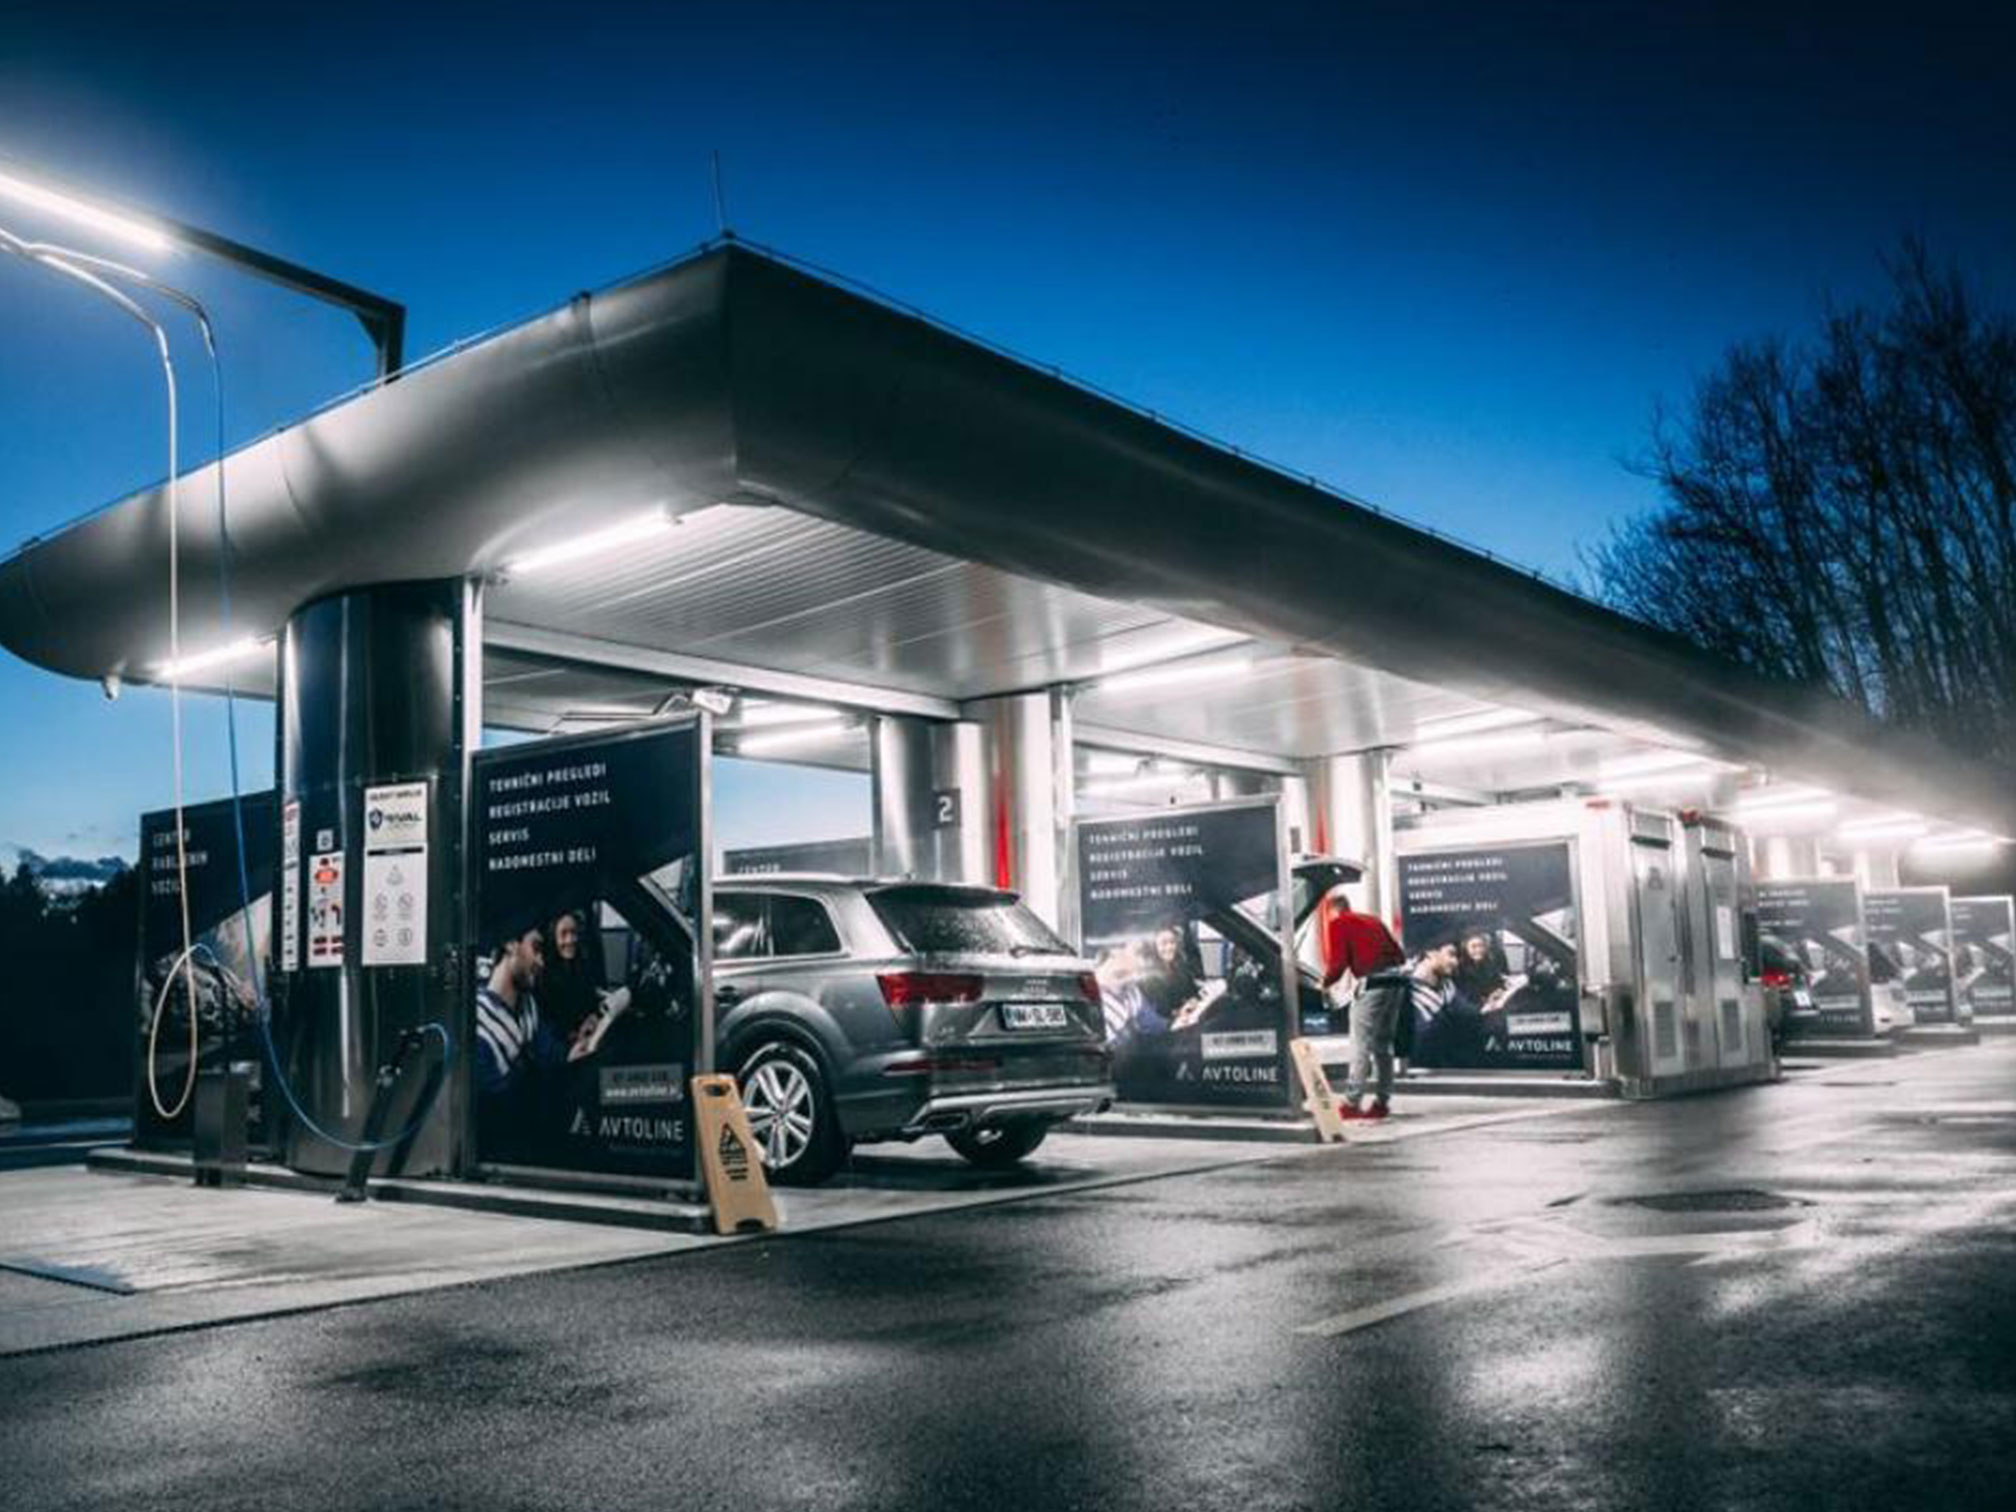 Avtoline (SI) – new car wash with R2W